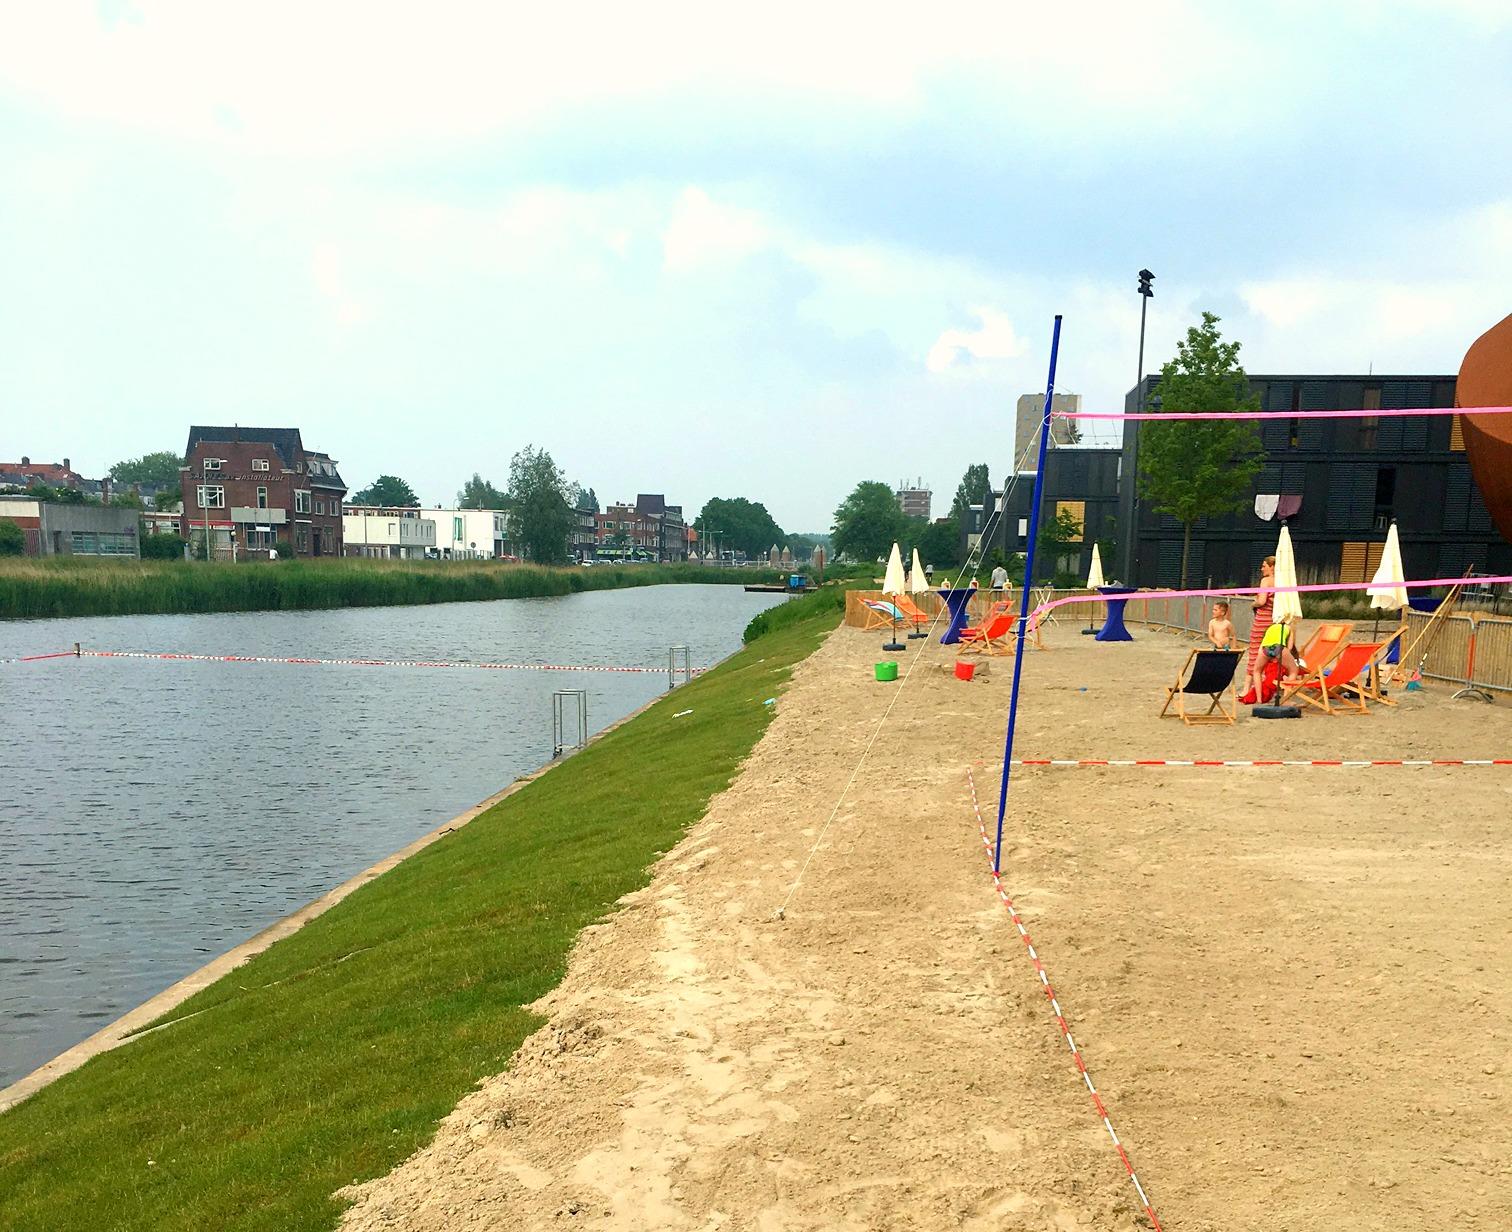 Stadsstrand Groningen: Zwemmen In De Stad!